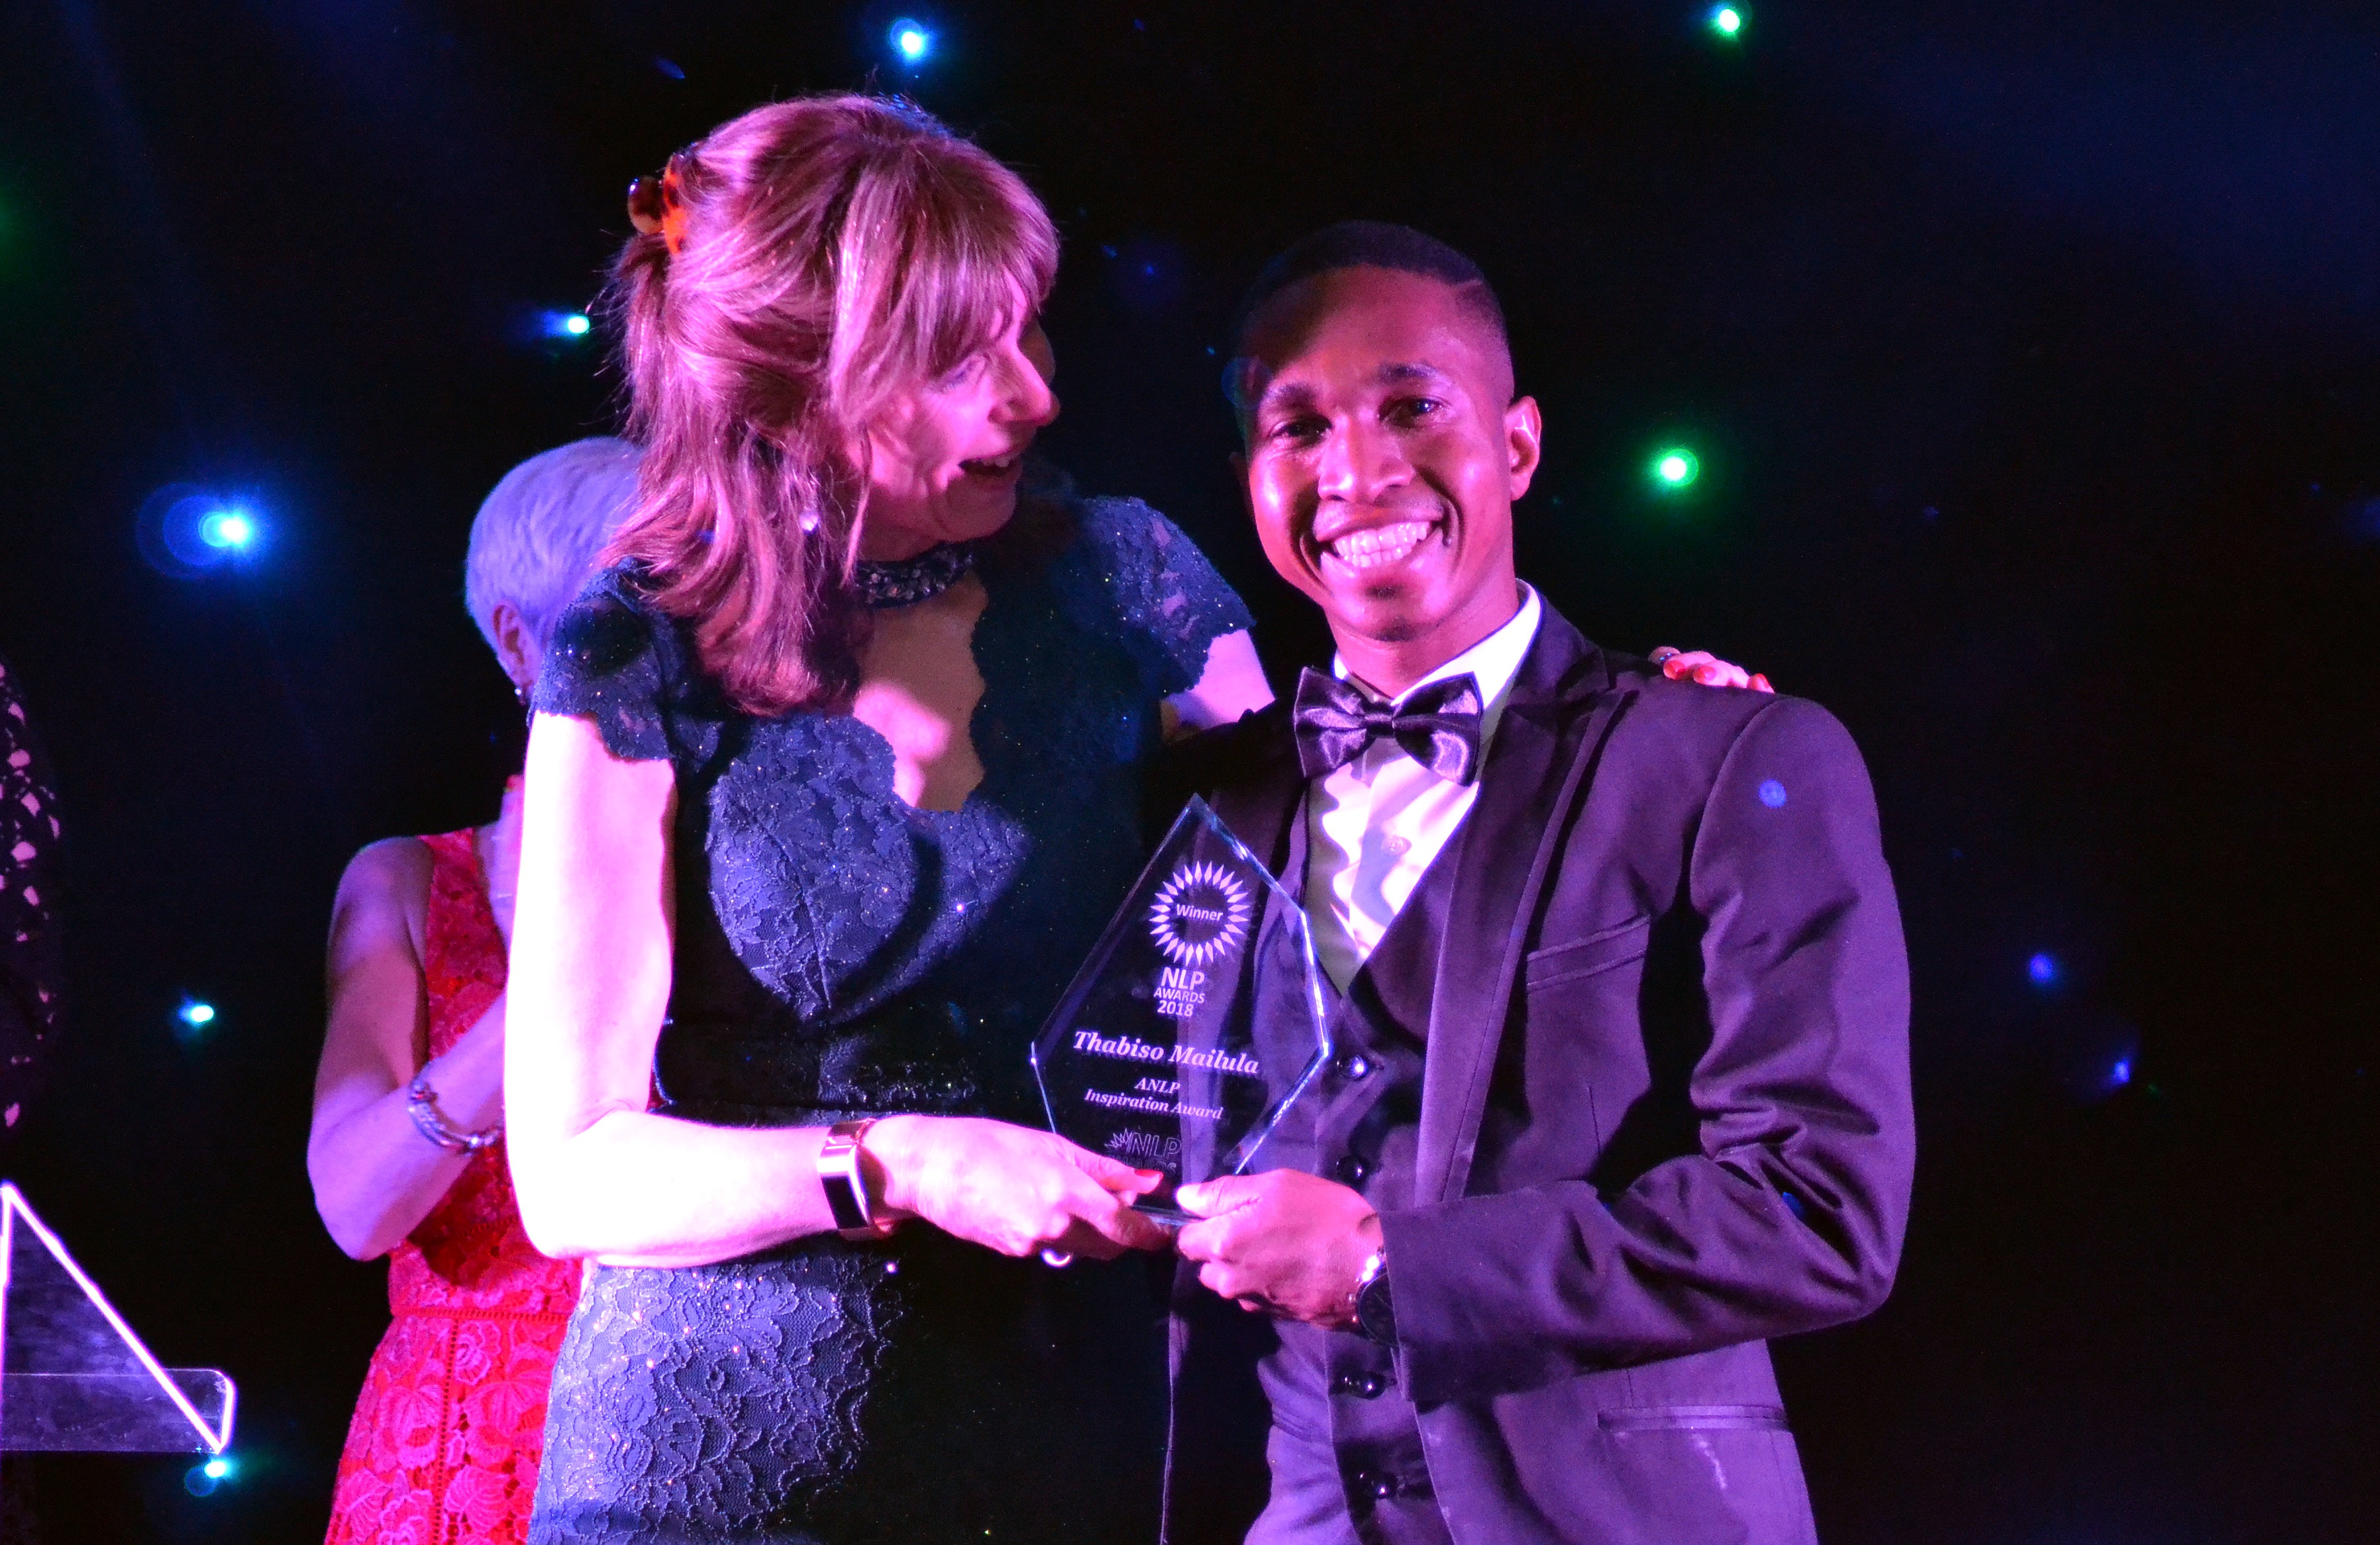 Thabiso Mailula 2018 Award winner